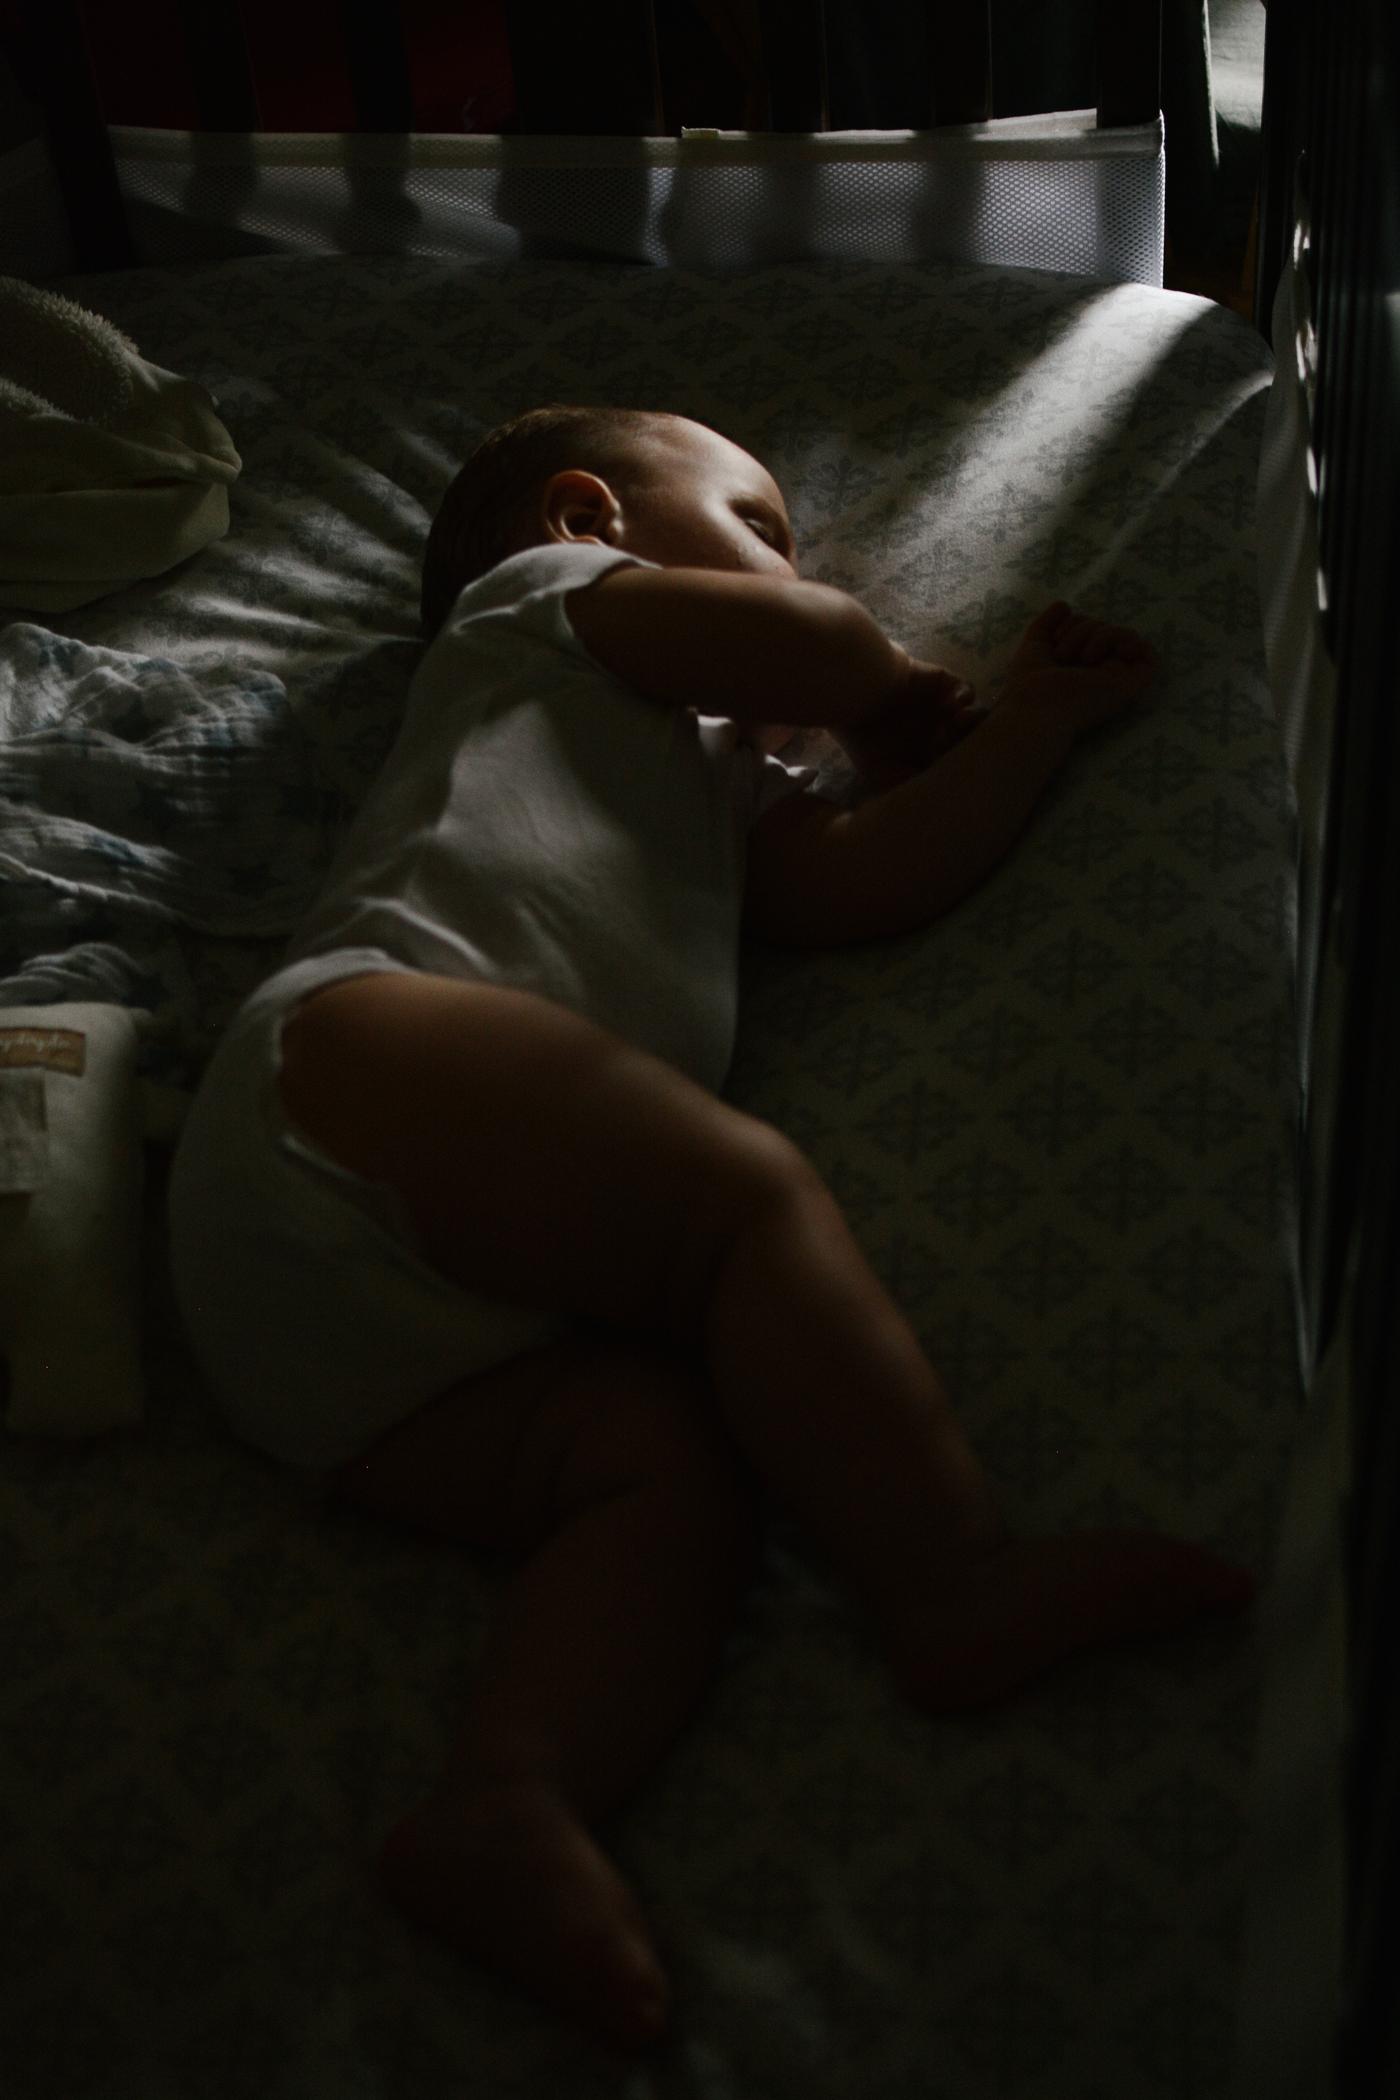 Bebe_toute_annee_Marianne_Charland_photographe_famille_nouveau-ne_enfant_Montreal_Basse-48.jpg